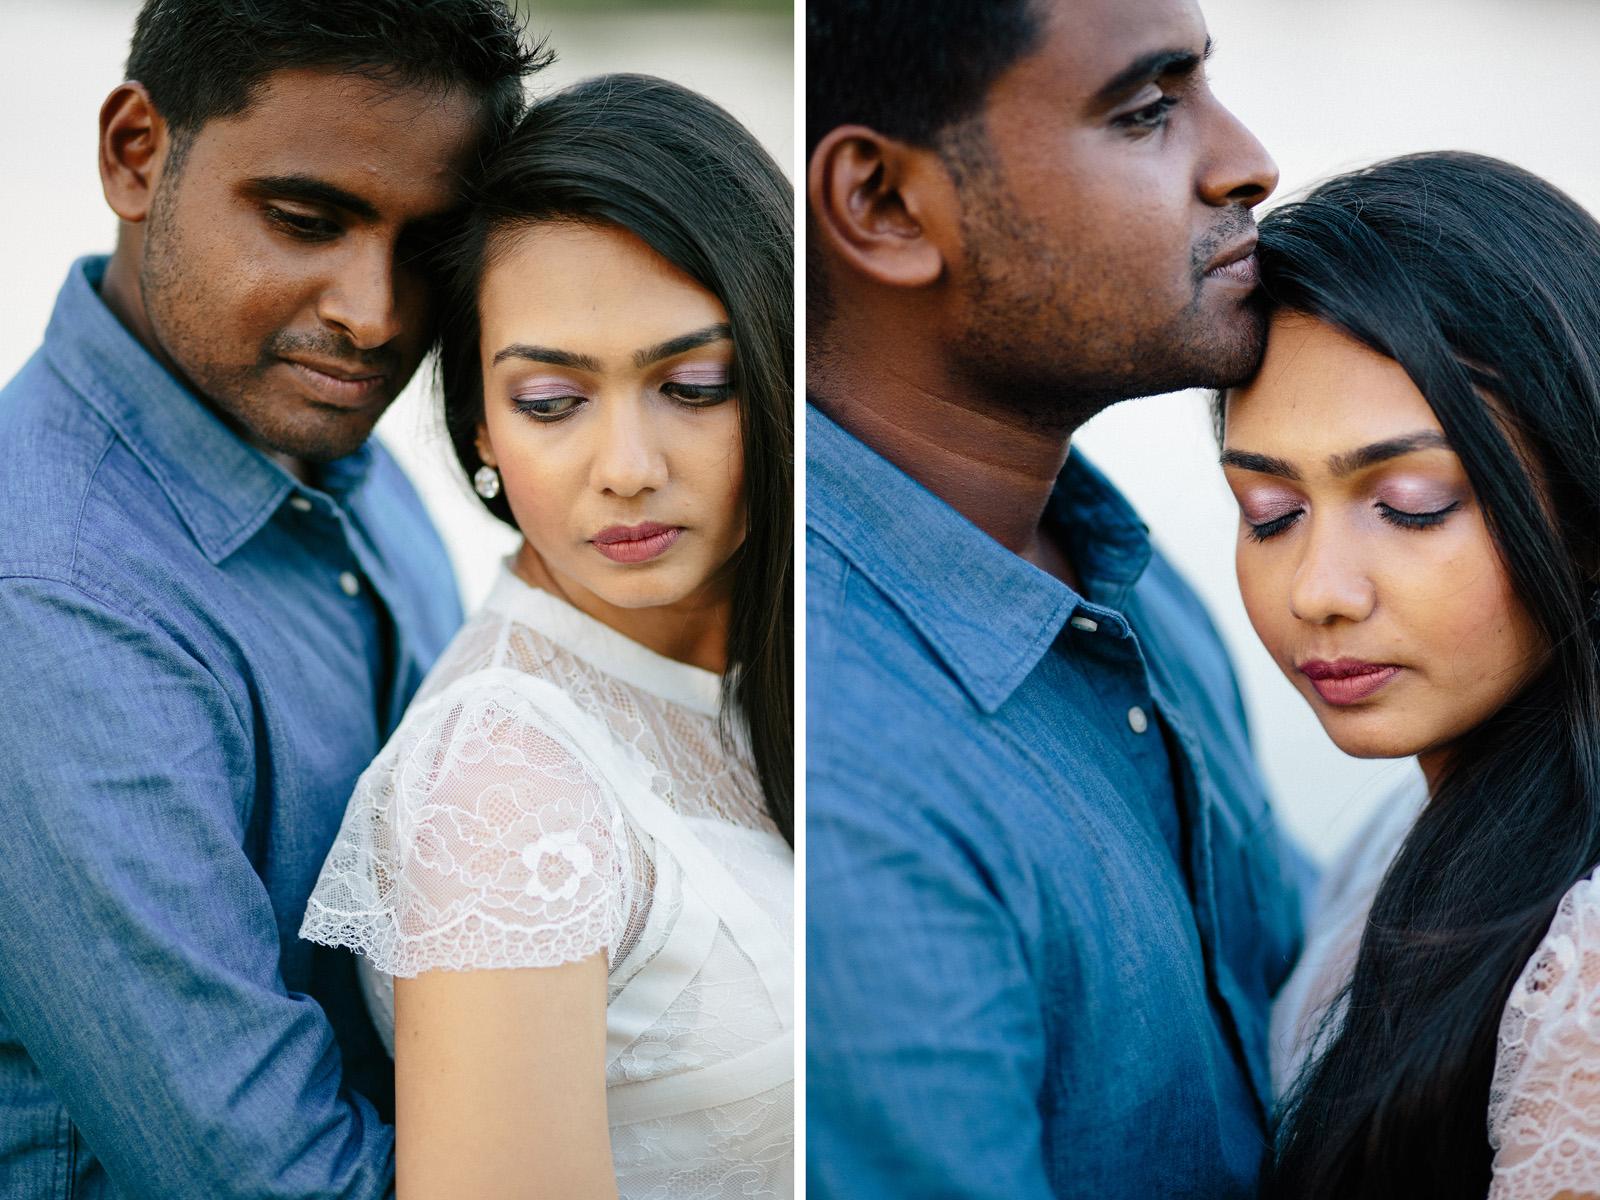 singapore-wedding-travel-photographer-abigail-caleb-wedding-wmt-14.jpg